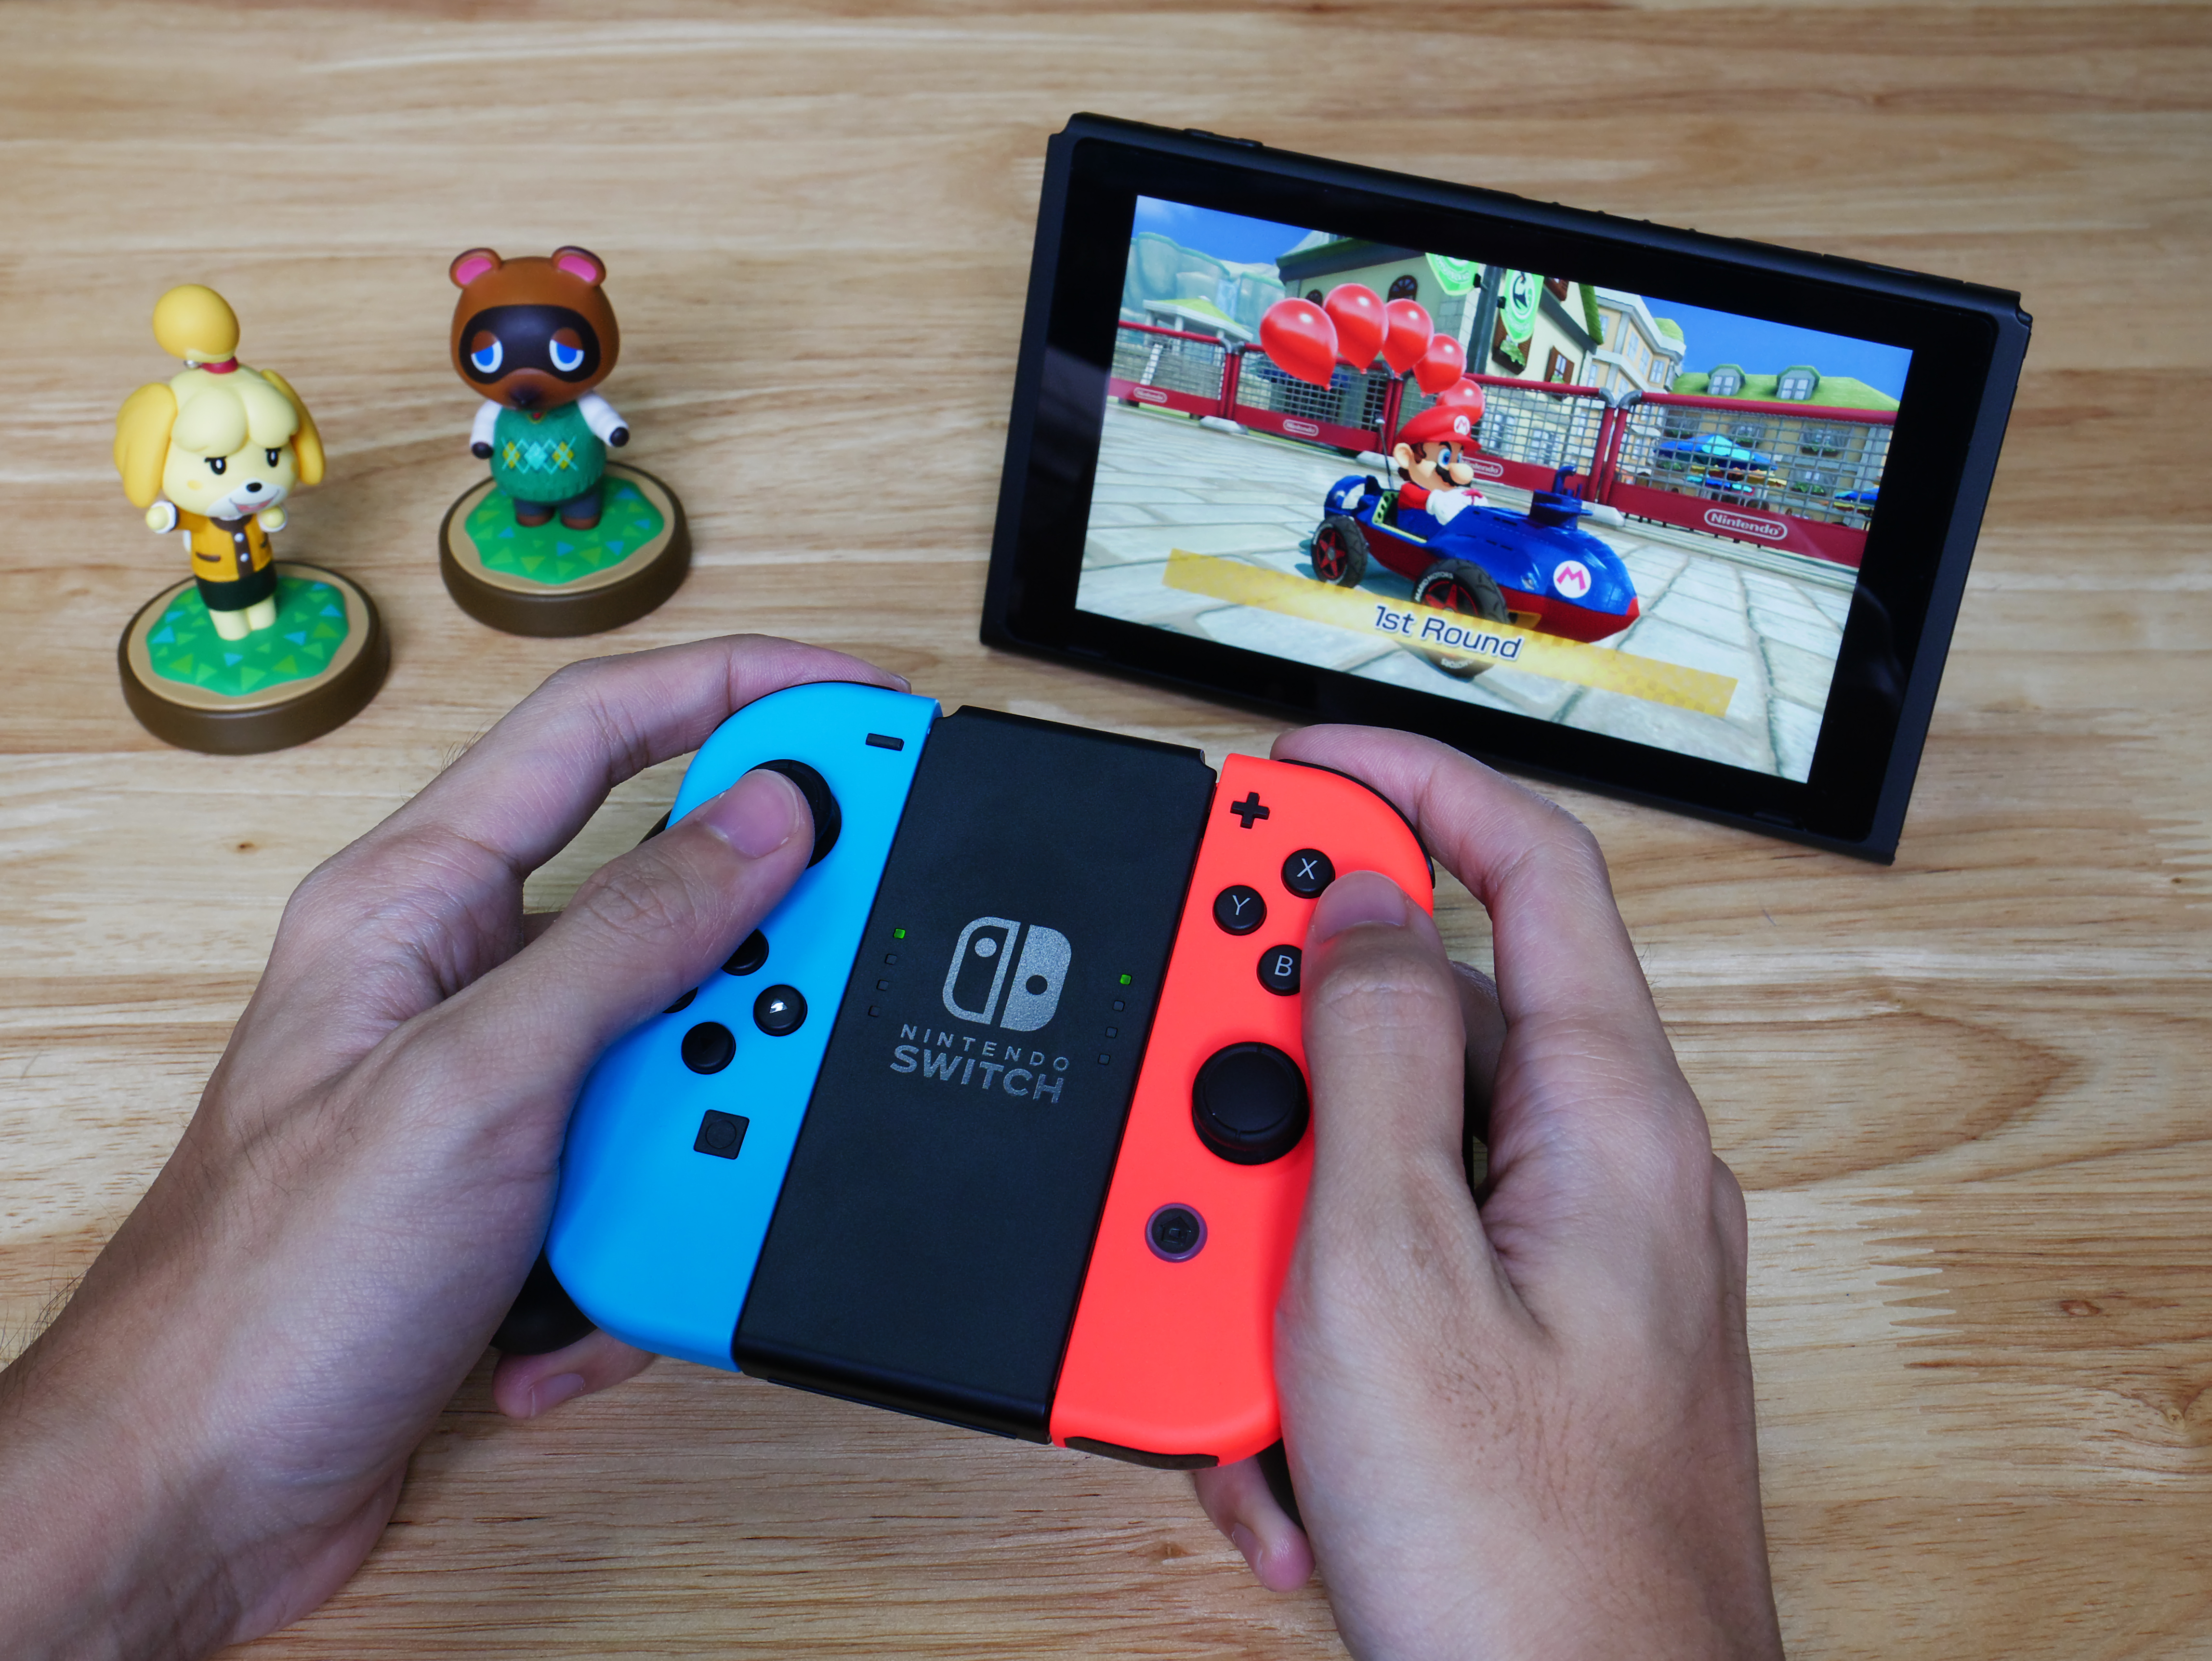 screenshot of Mii's on the Nintendo Wii